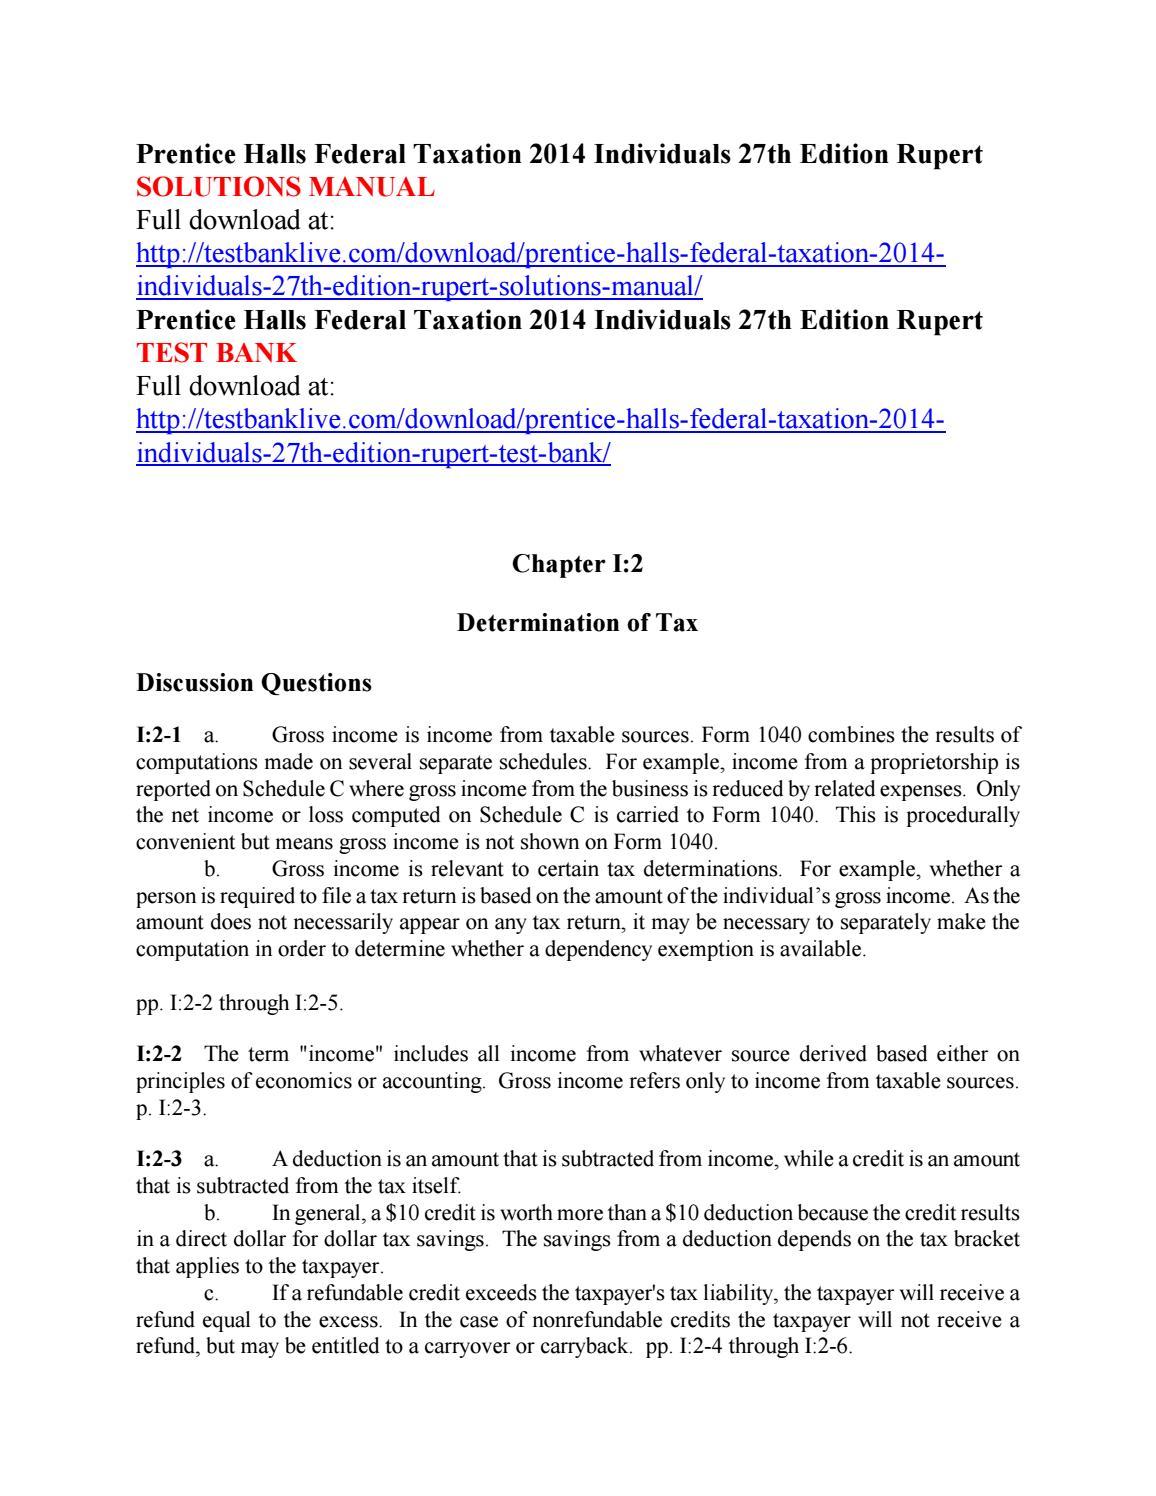 prentice halls federal taxation 2014 individuals 27th edition rupert rh issuu com